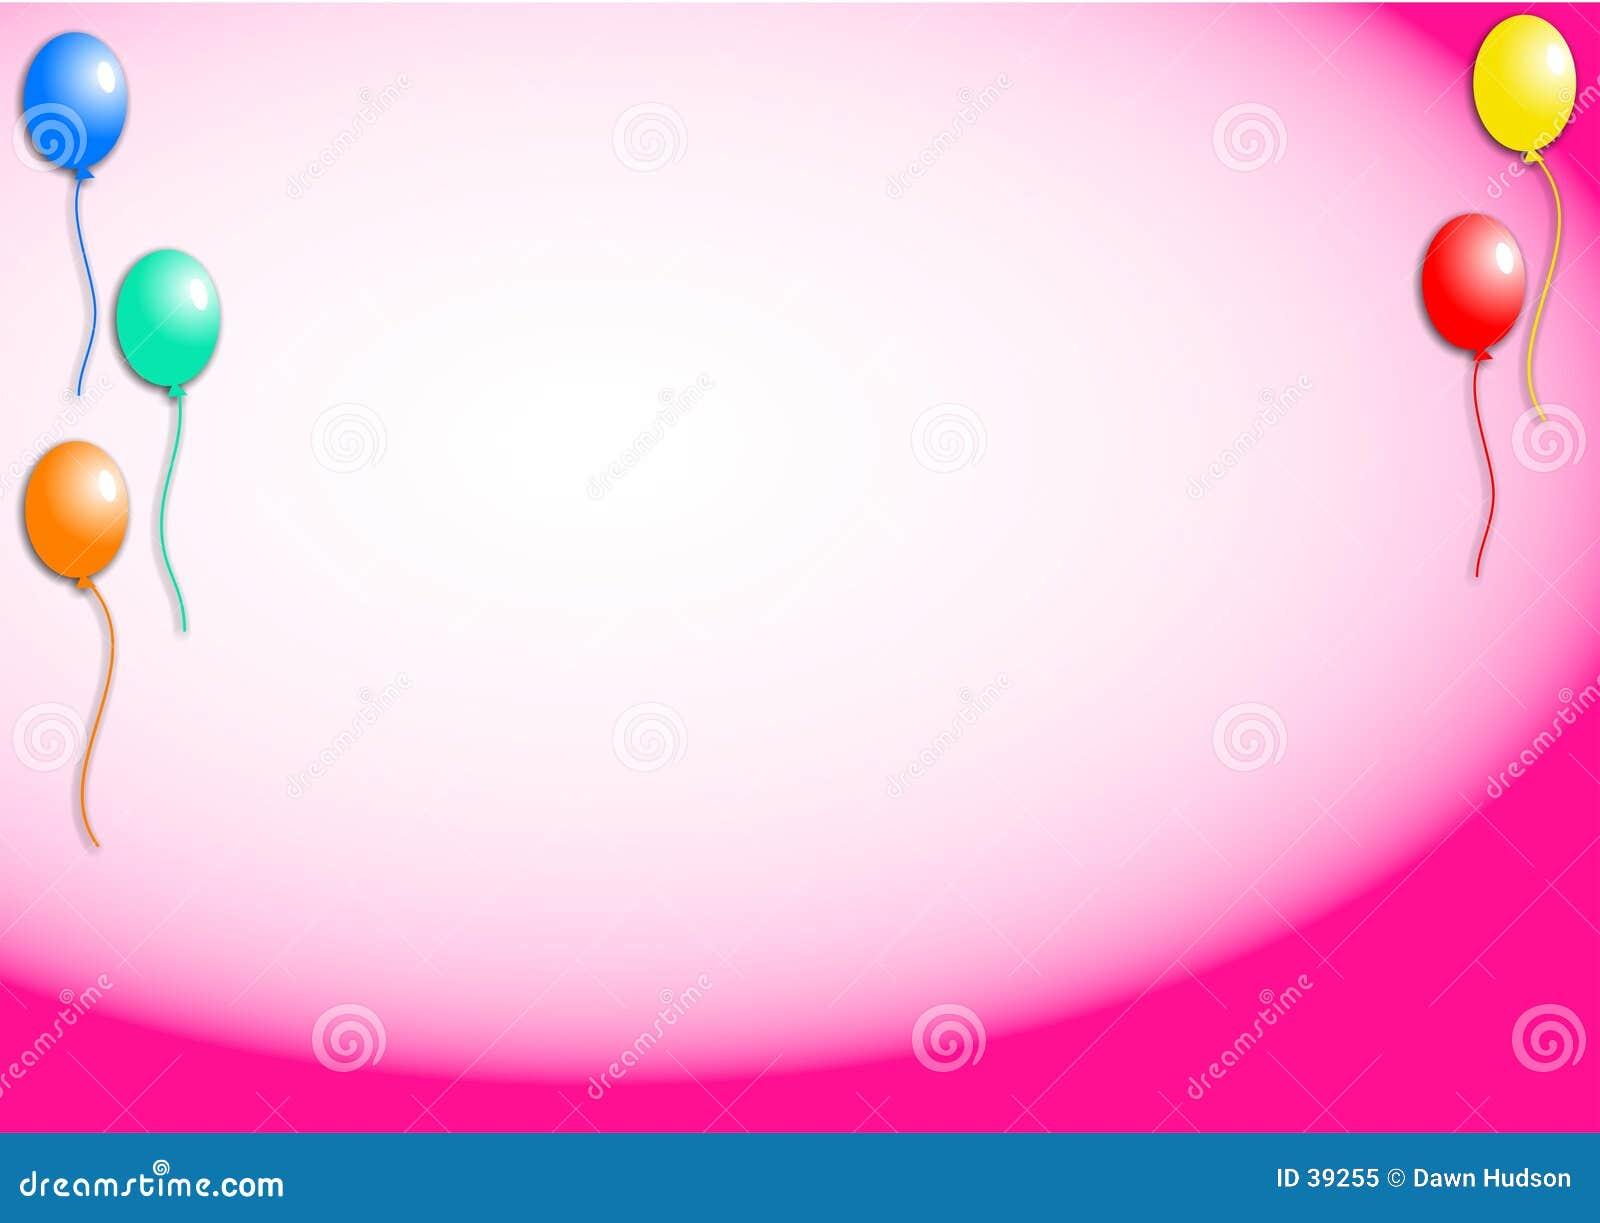 Ballon-Hintergrund